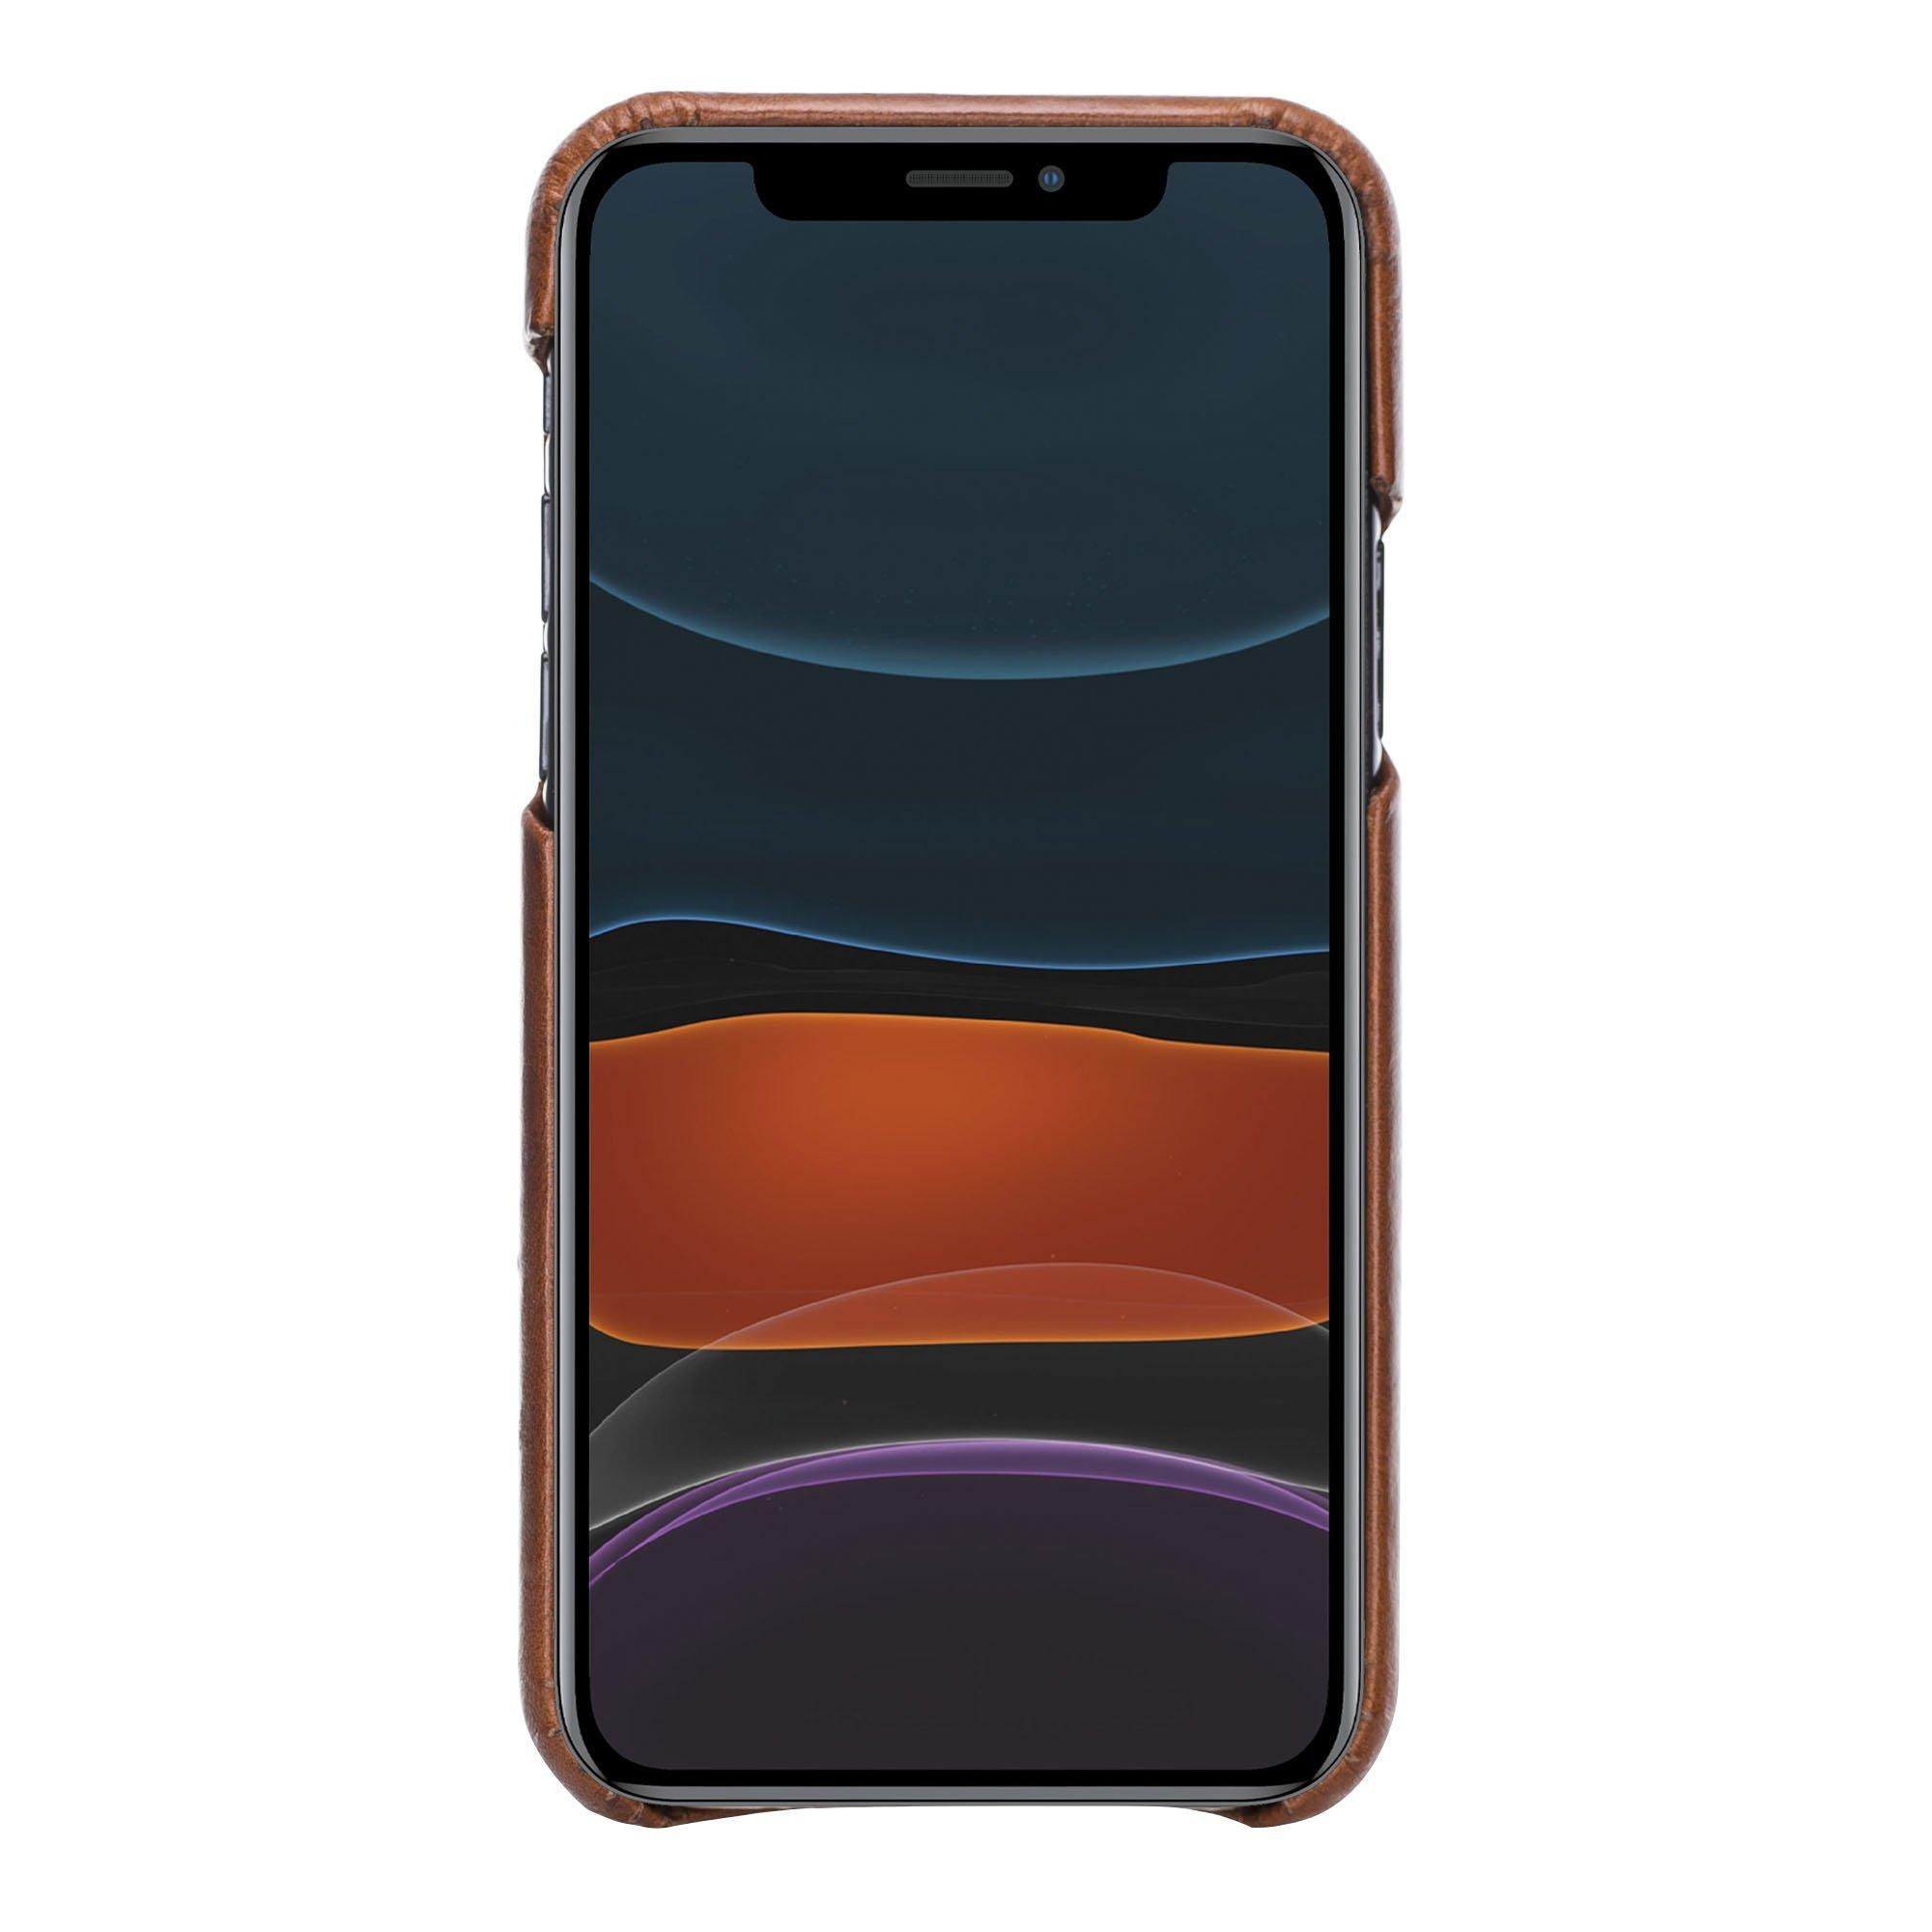 Lederhülle kompatibel für iPhone 11 Pro in 5.8 Zoll abnehmbare Hülle Clemson (2in1) inkl. Kartenfächer (Vollleder Steingrau)